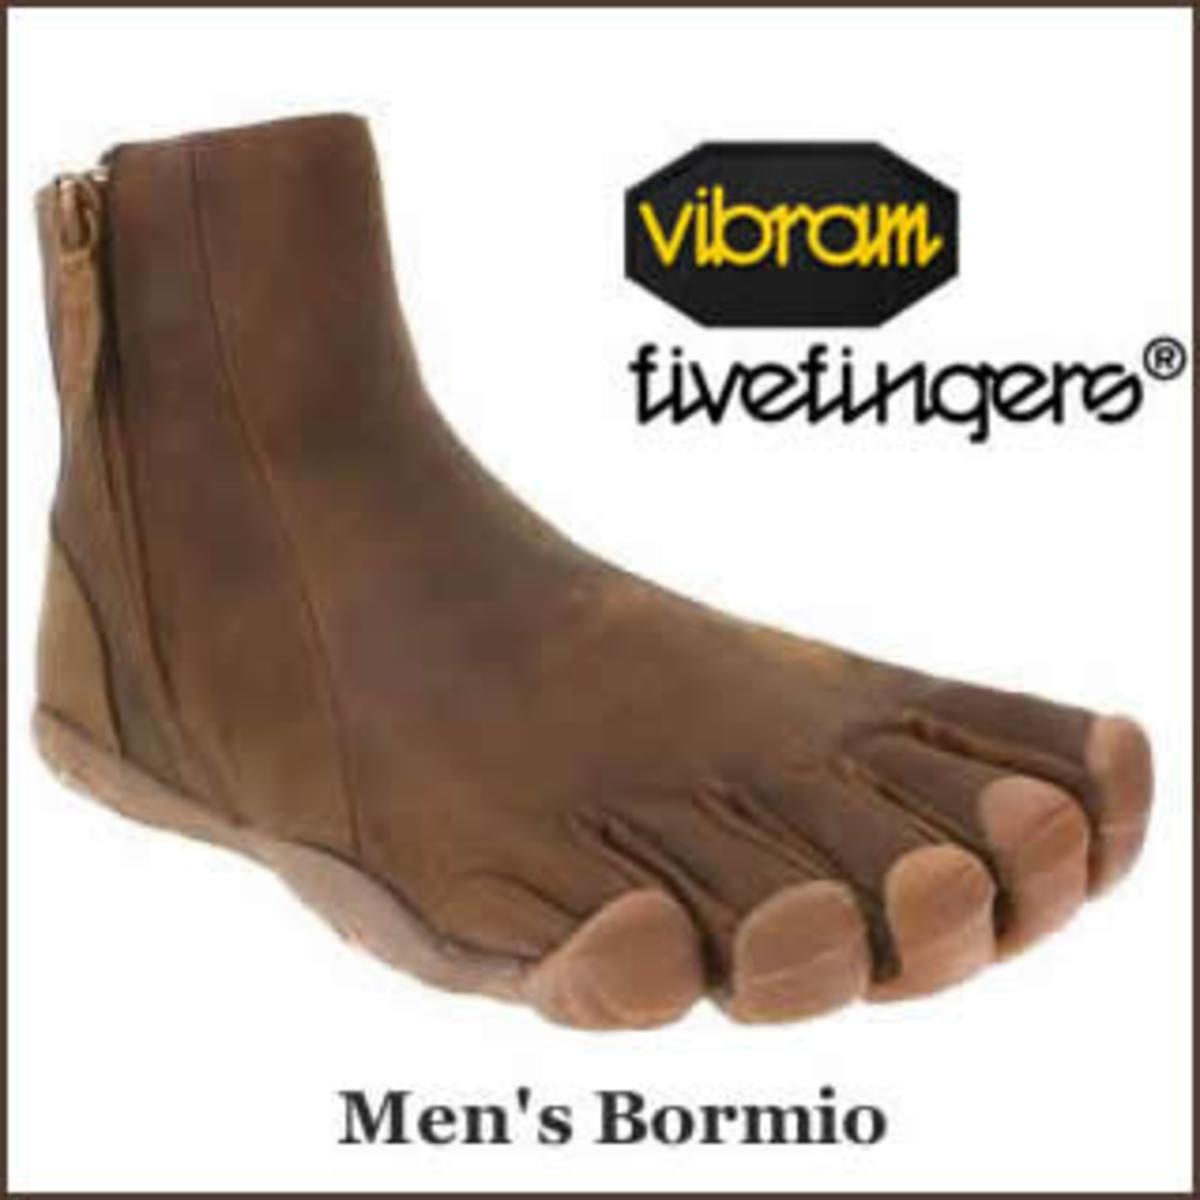 Vibram Men's Bormio Boots Released in the US